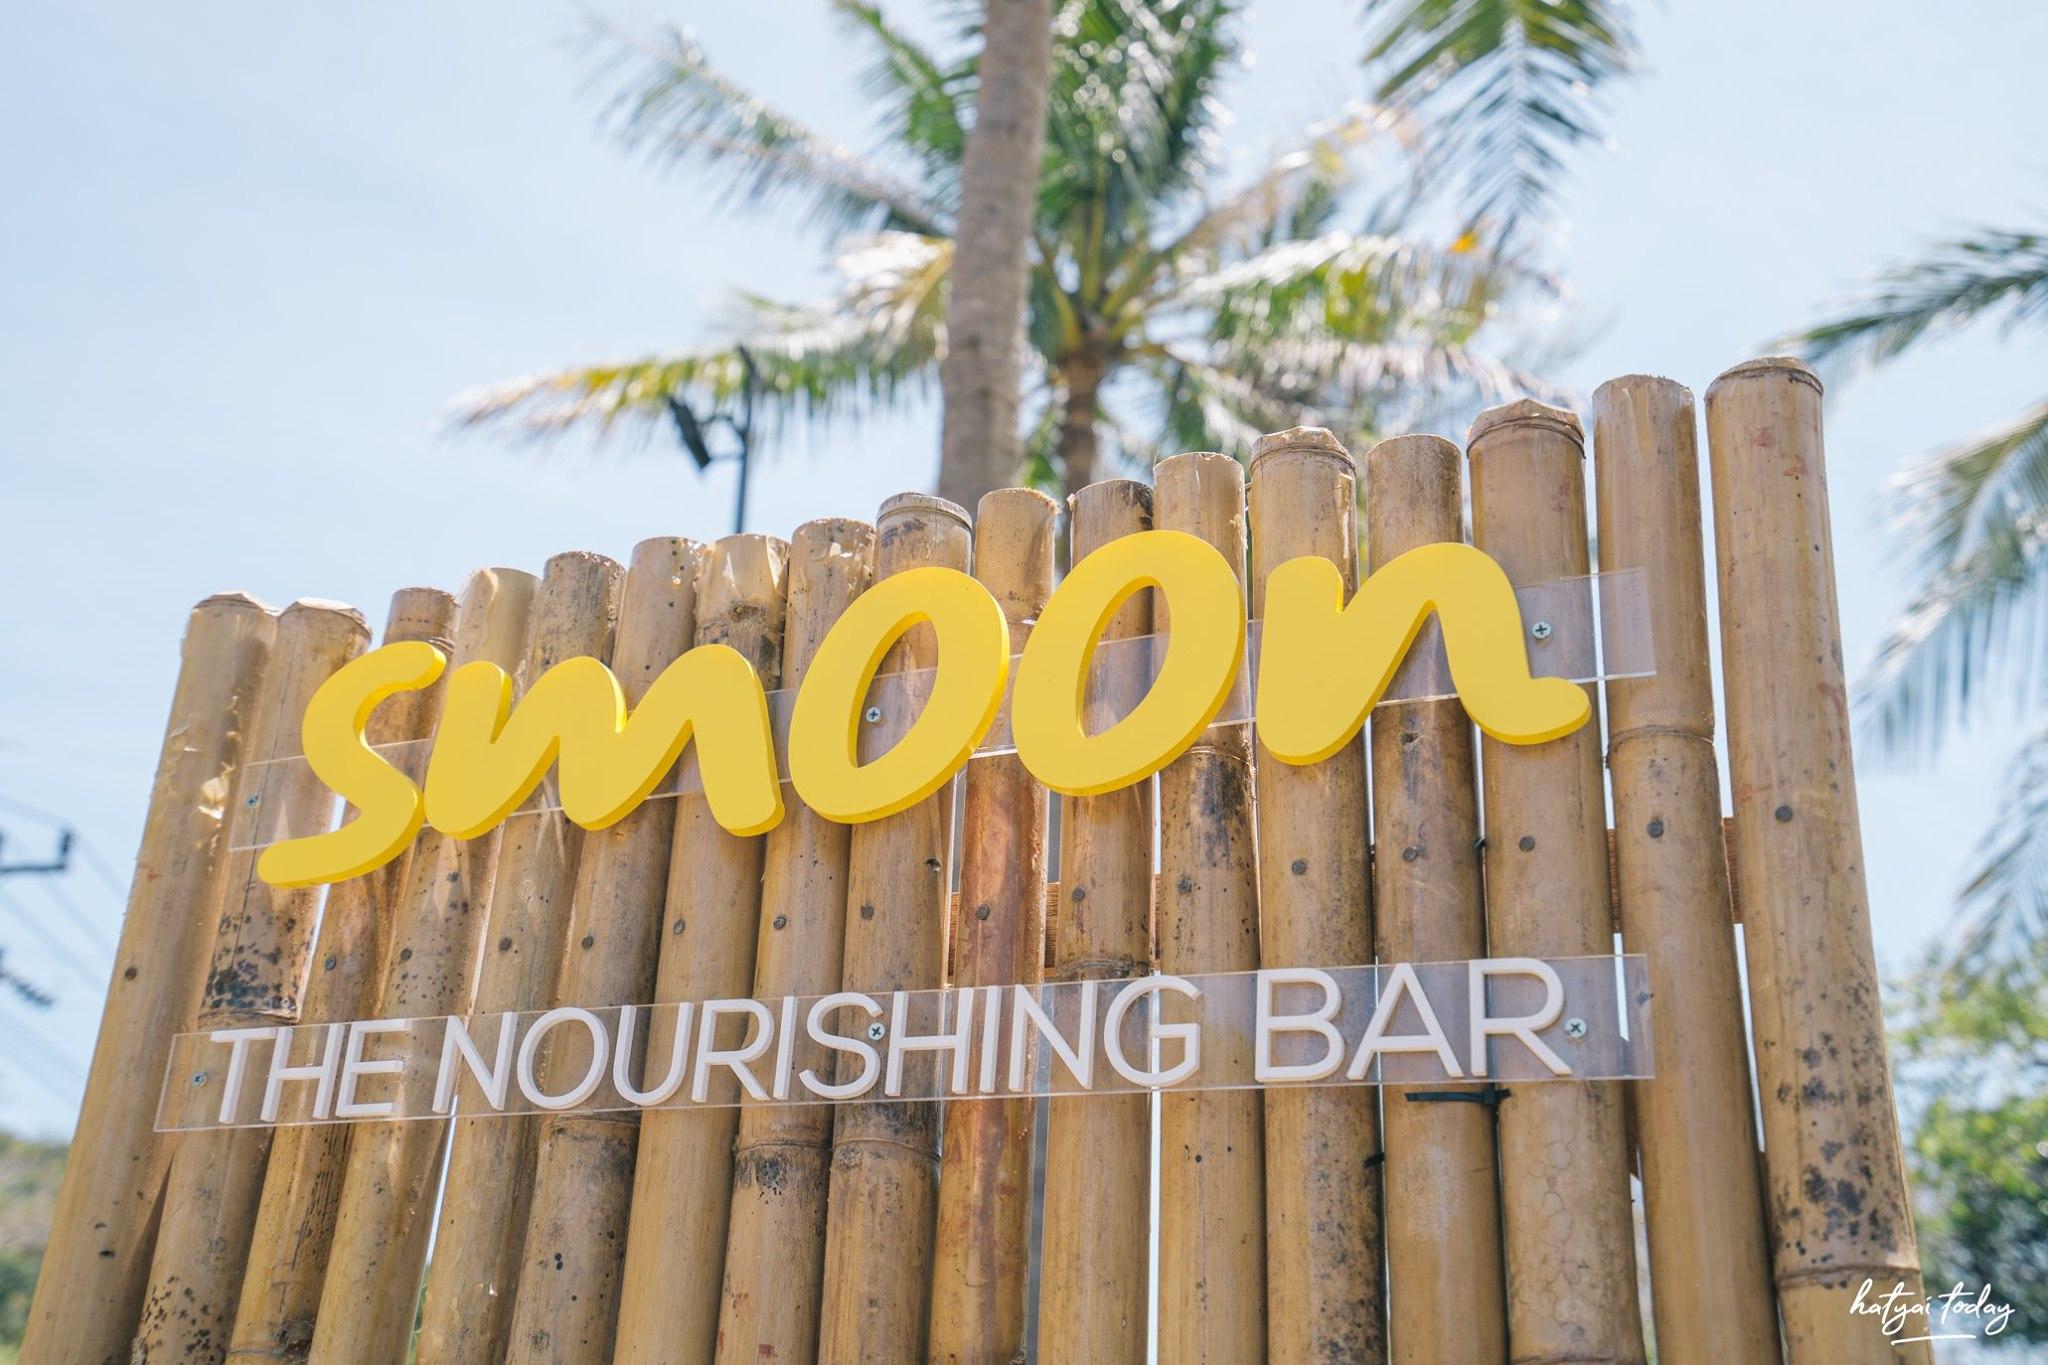 Smoon Cafe' ที่เที่ยวเกาะลันตา